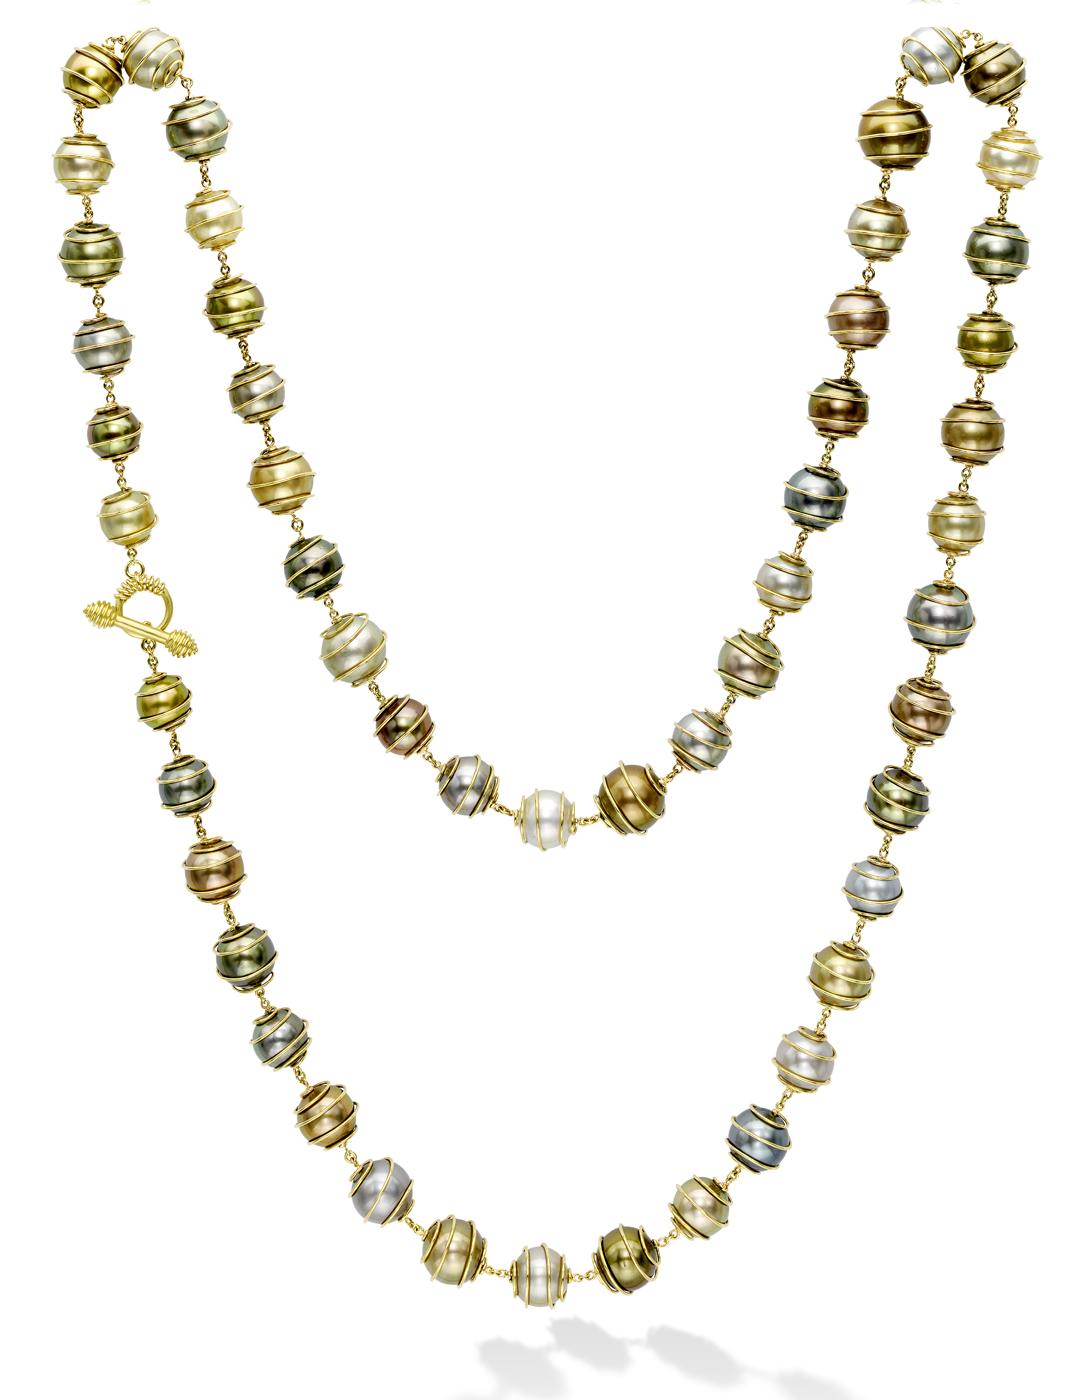 mish_necklaces_Orbiting-Prl-Tah-NK-1